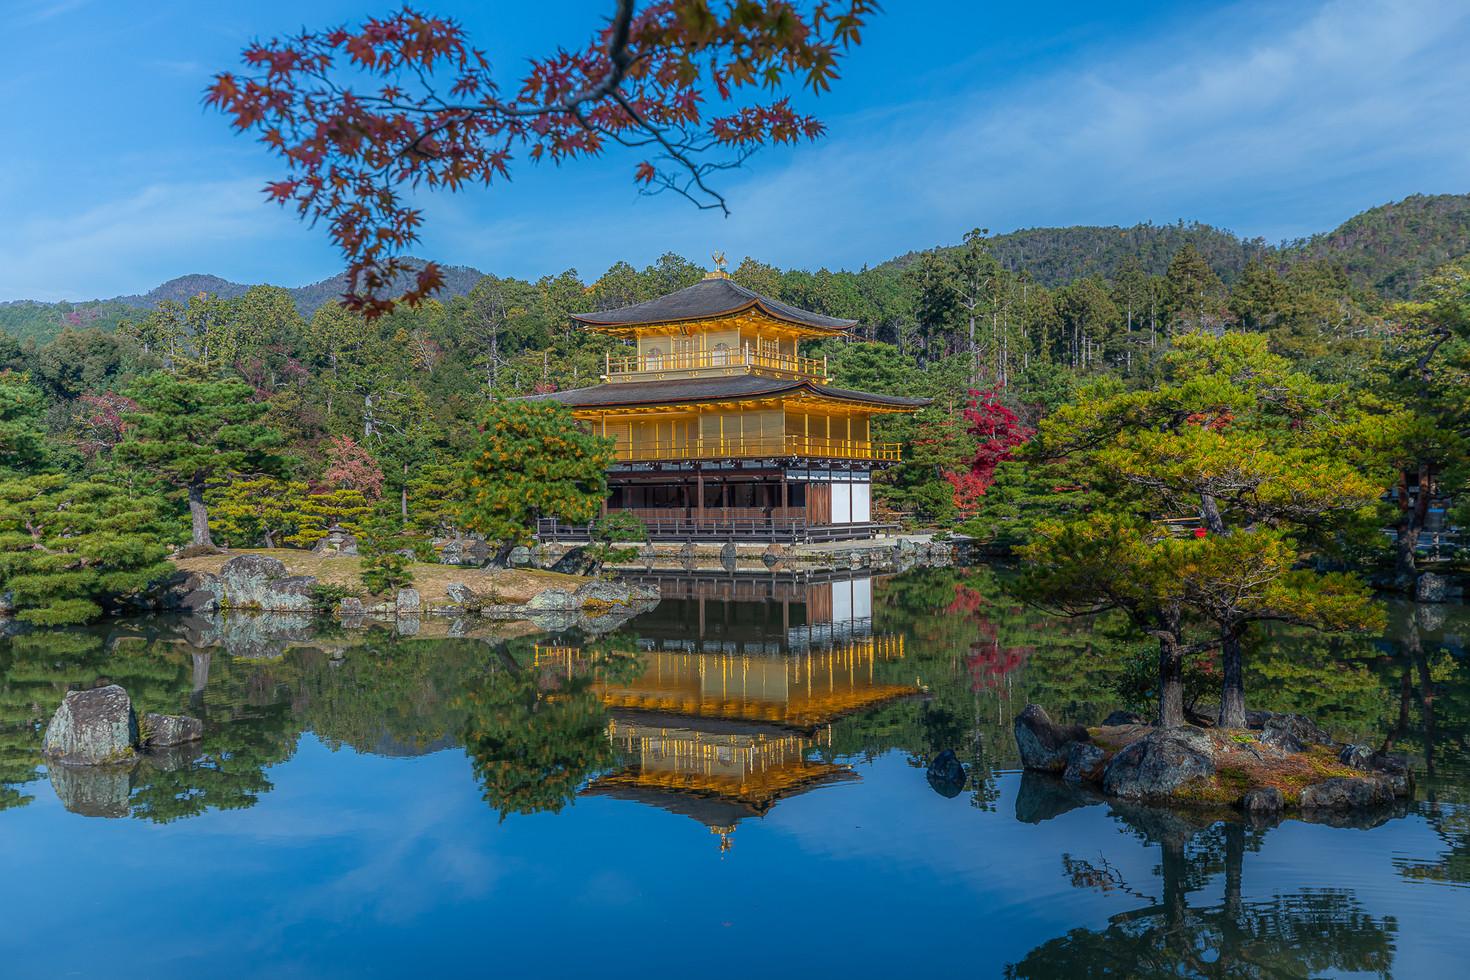 TKPA-Kyoto201911-0468-HDWH.jpg